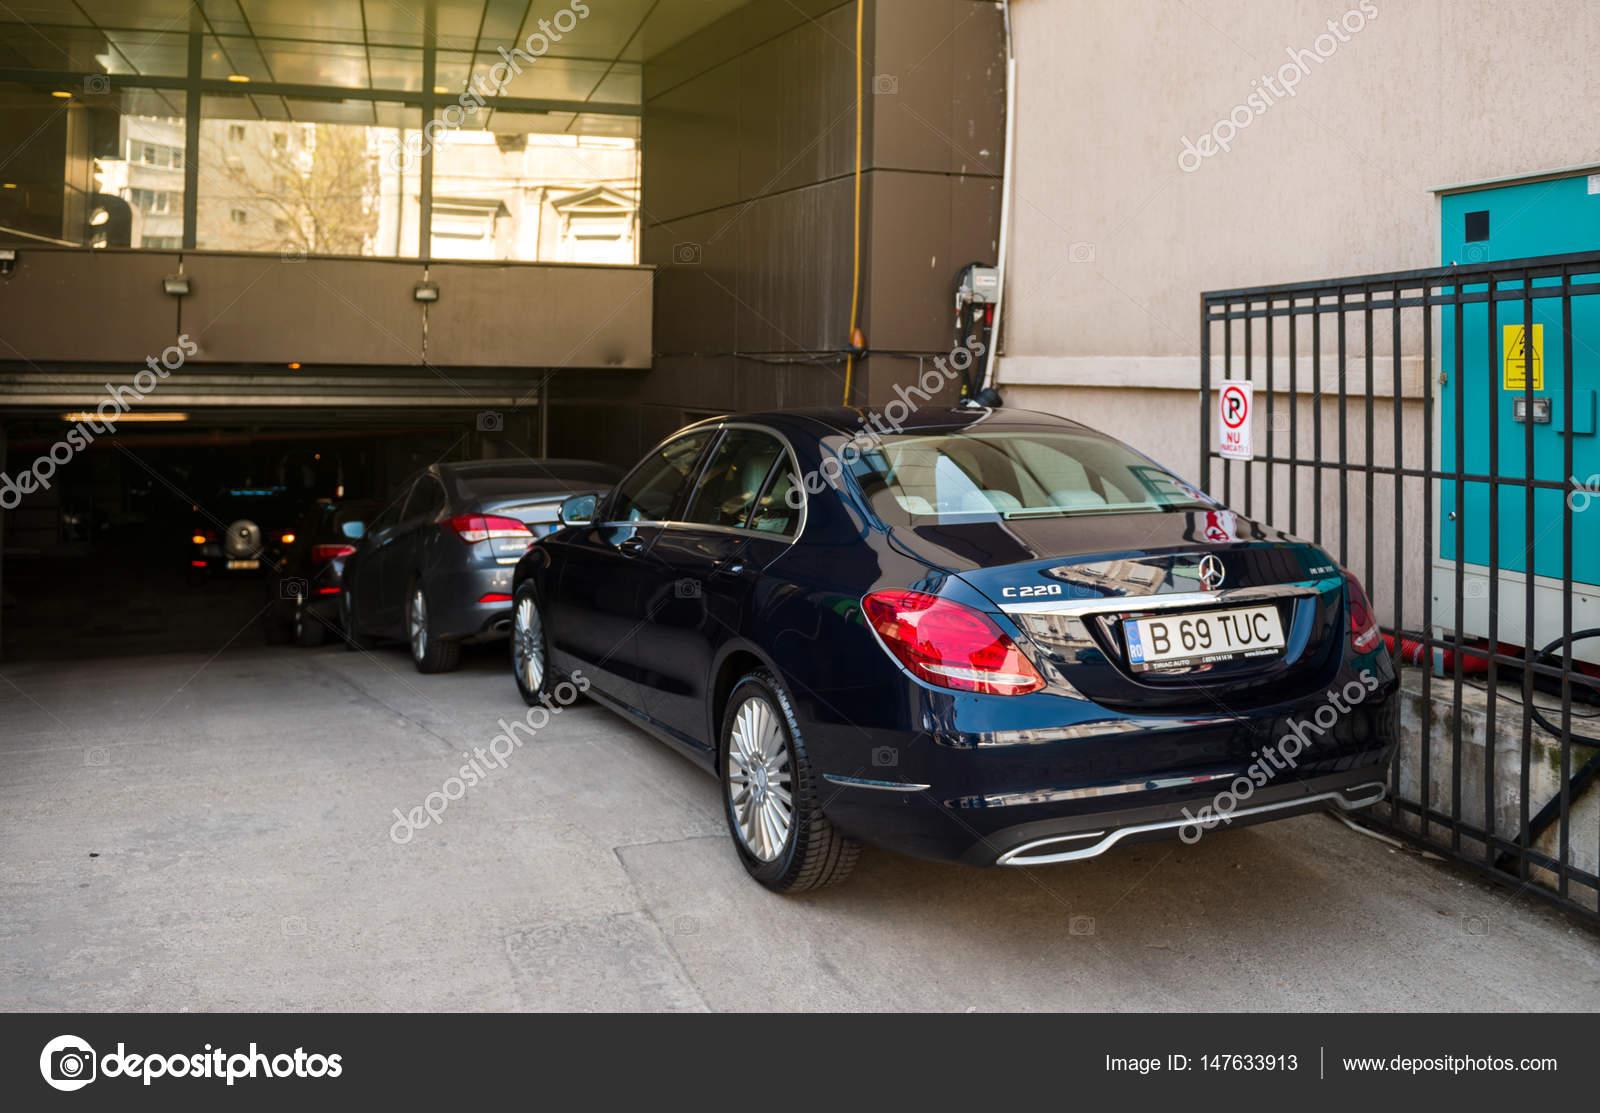 mercedes-benz c-klasse geparkt vor große garage tor — redaktionelles